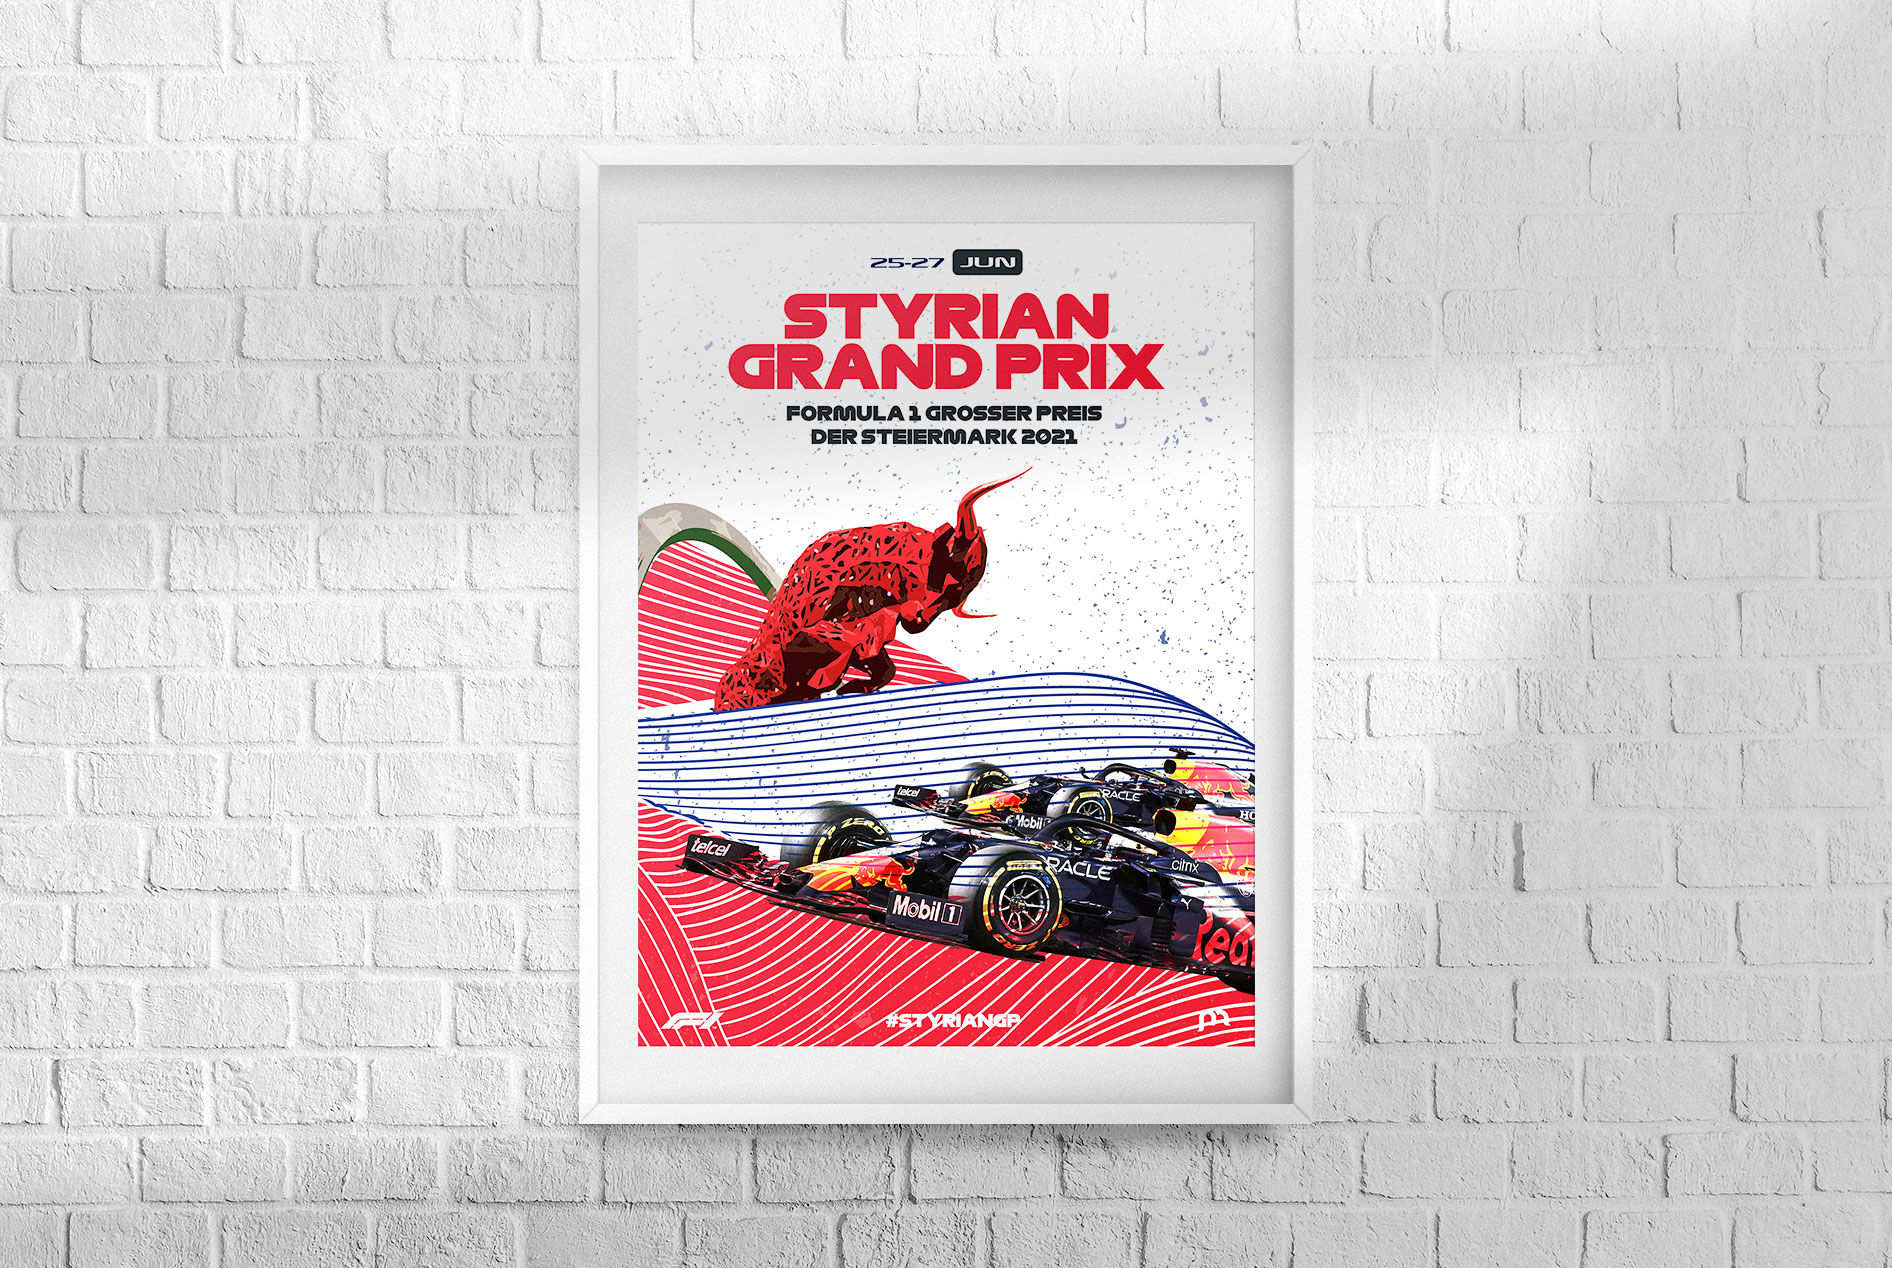 Styrian F1 Grand Prix 2021 Poster